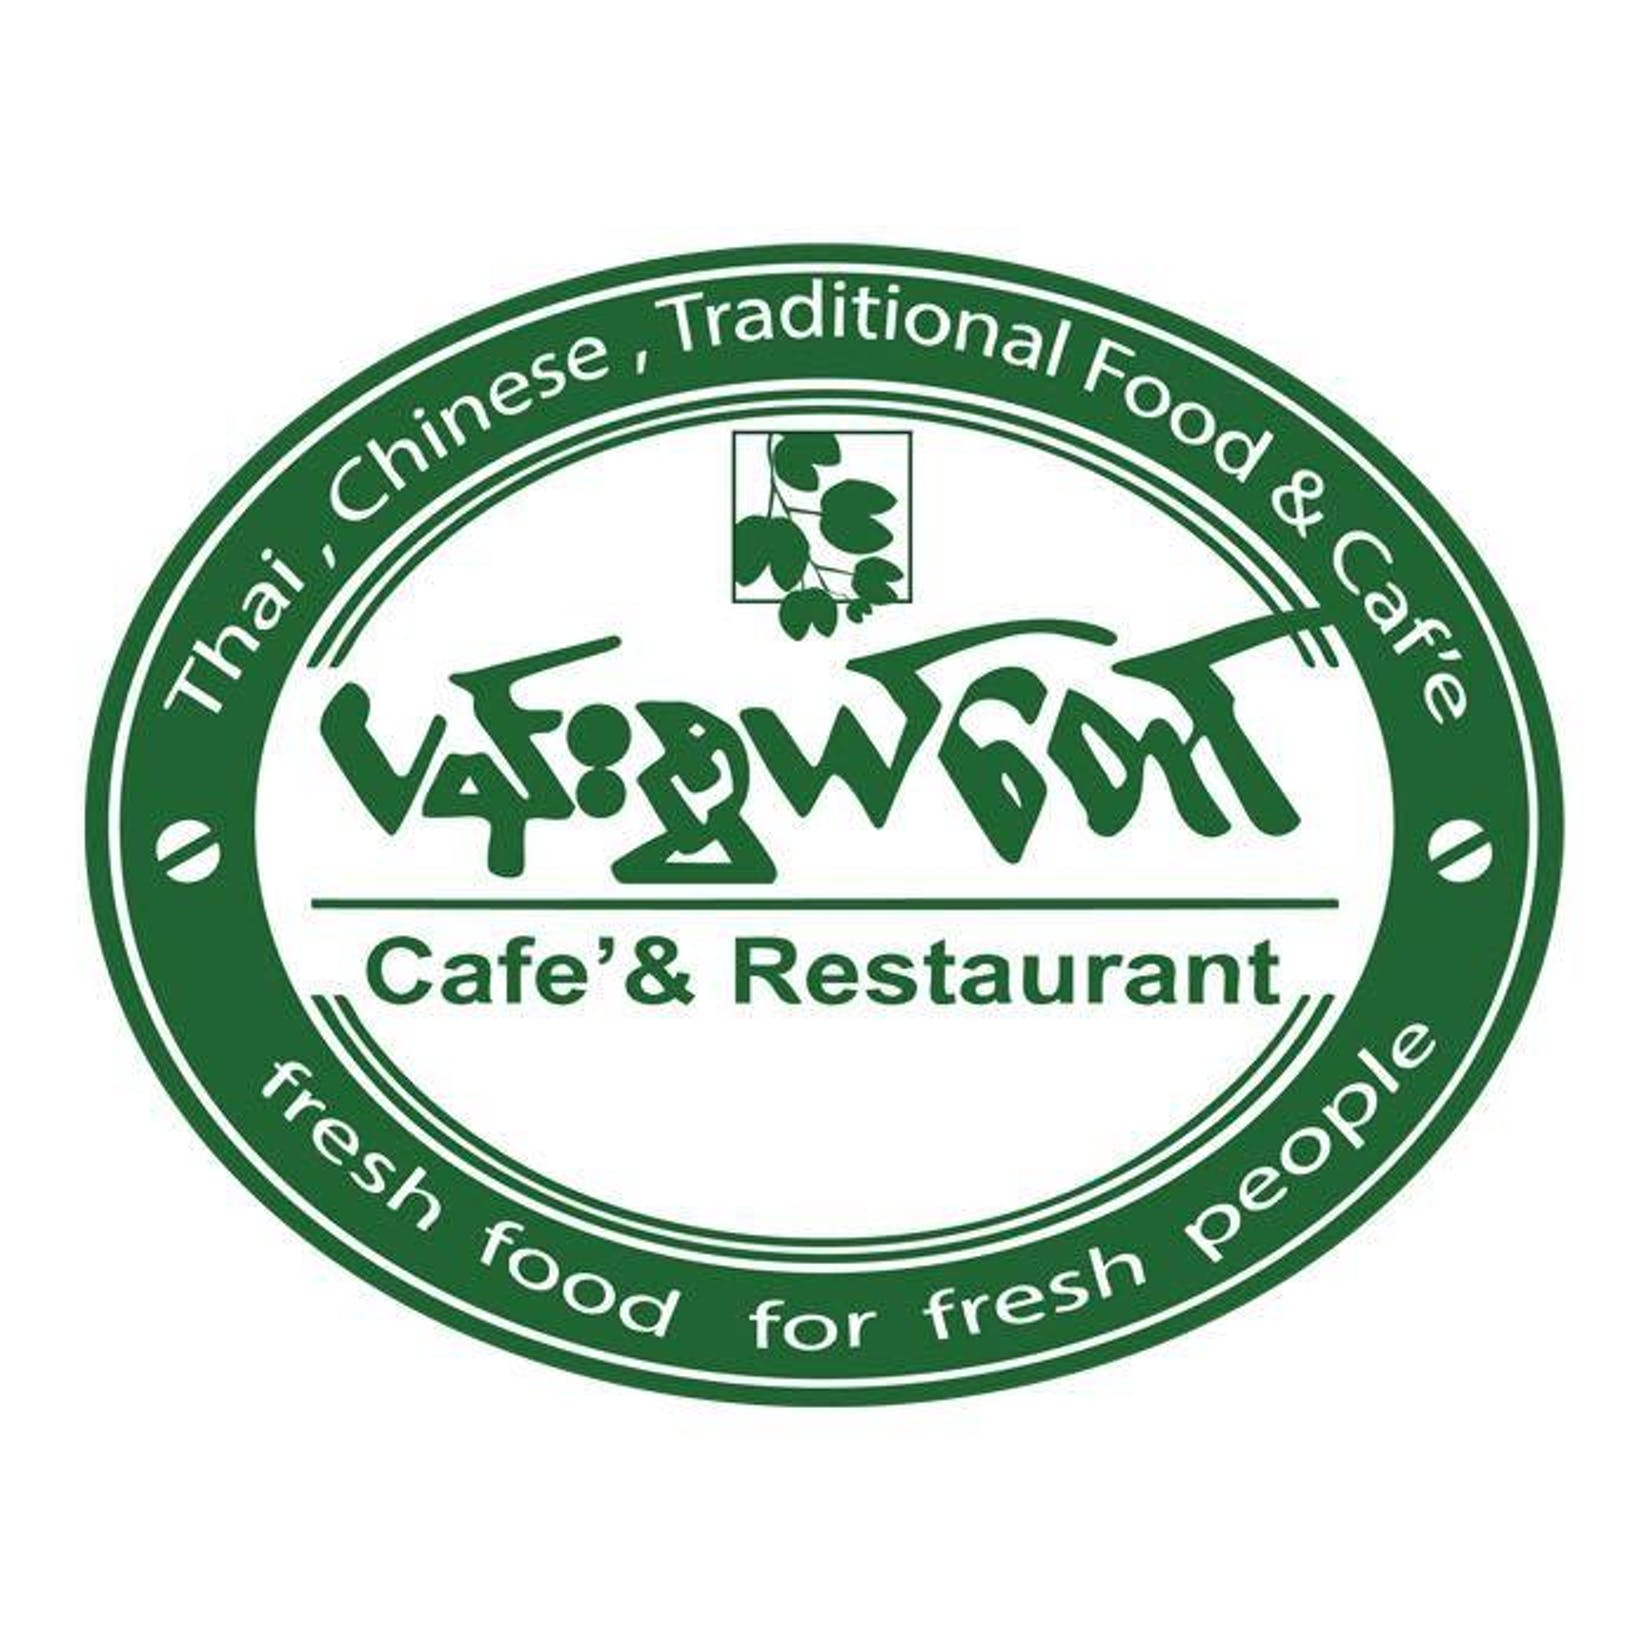 Pan Swel Taw cafe & restaurant (9 Mile Ocean) | yathar